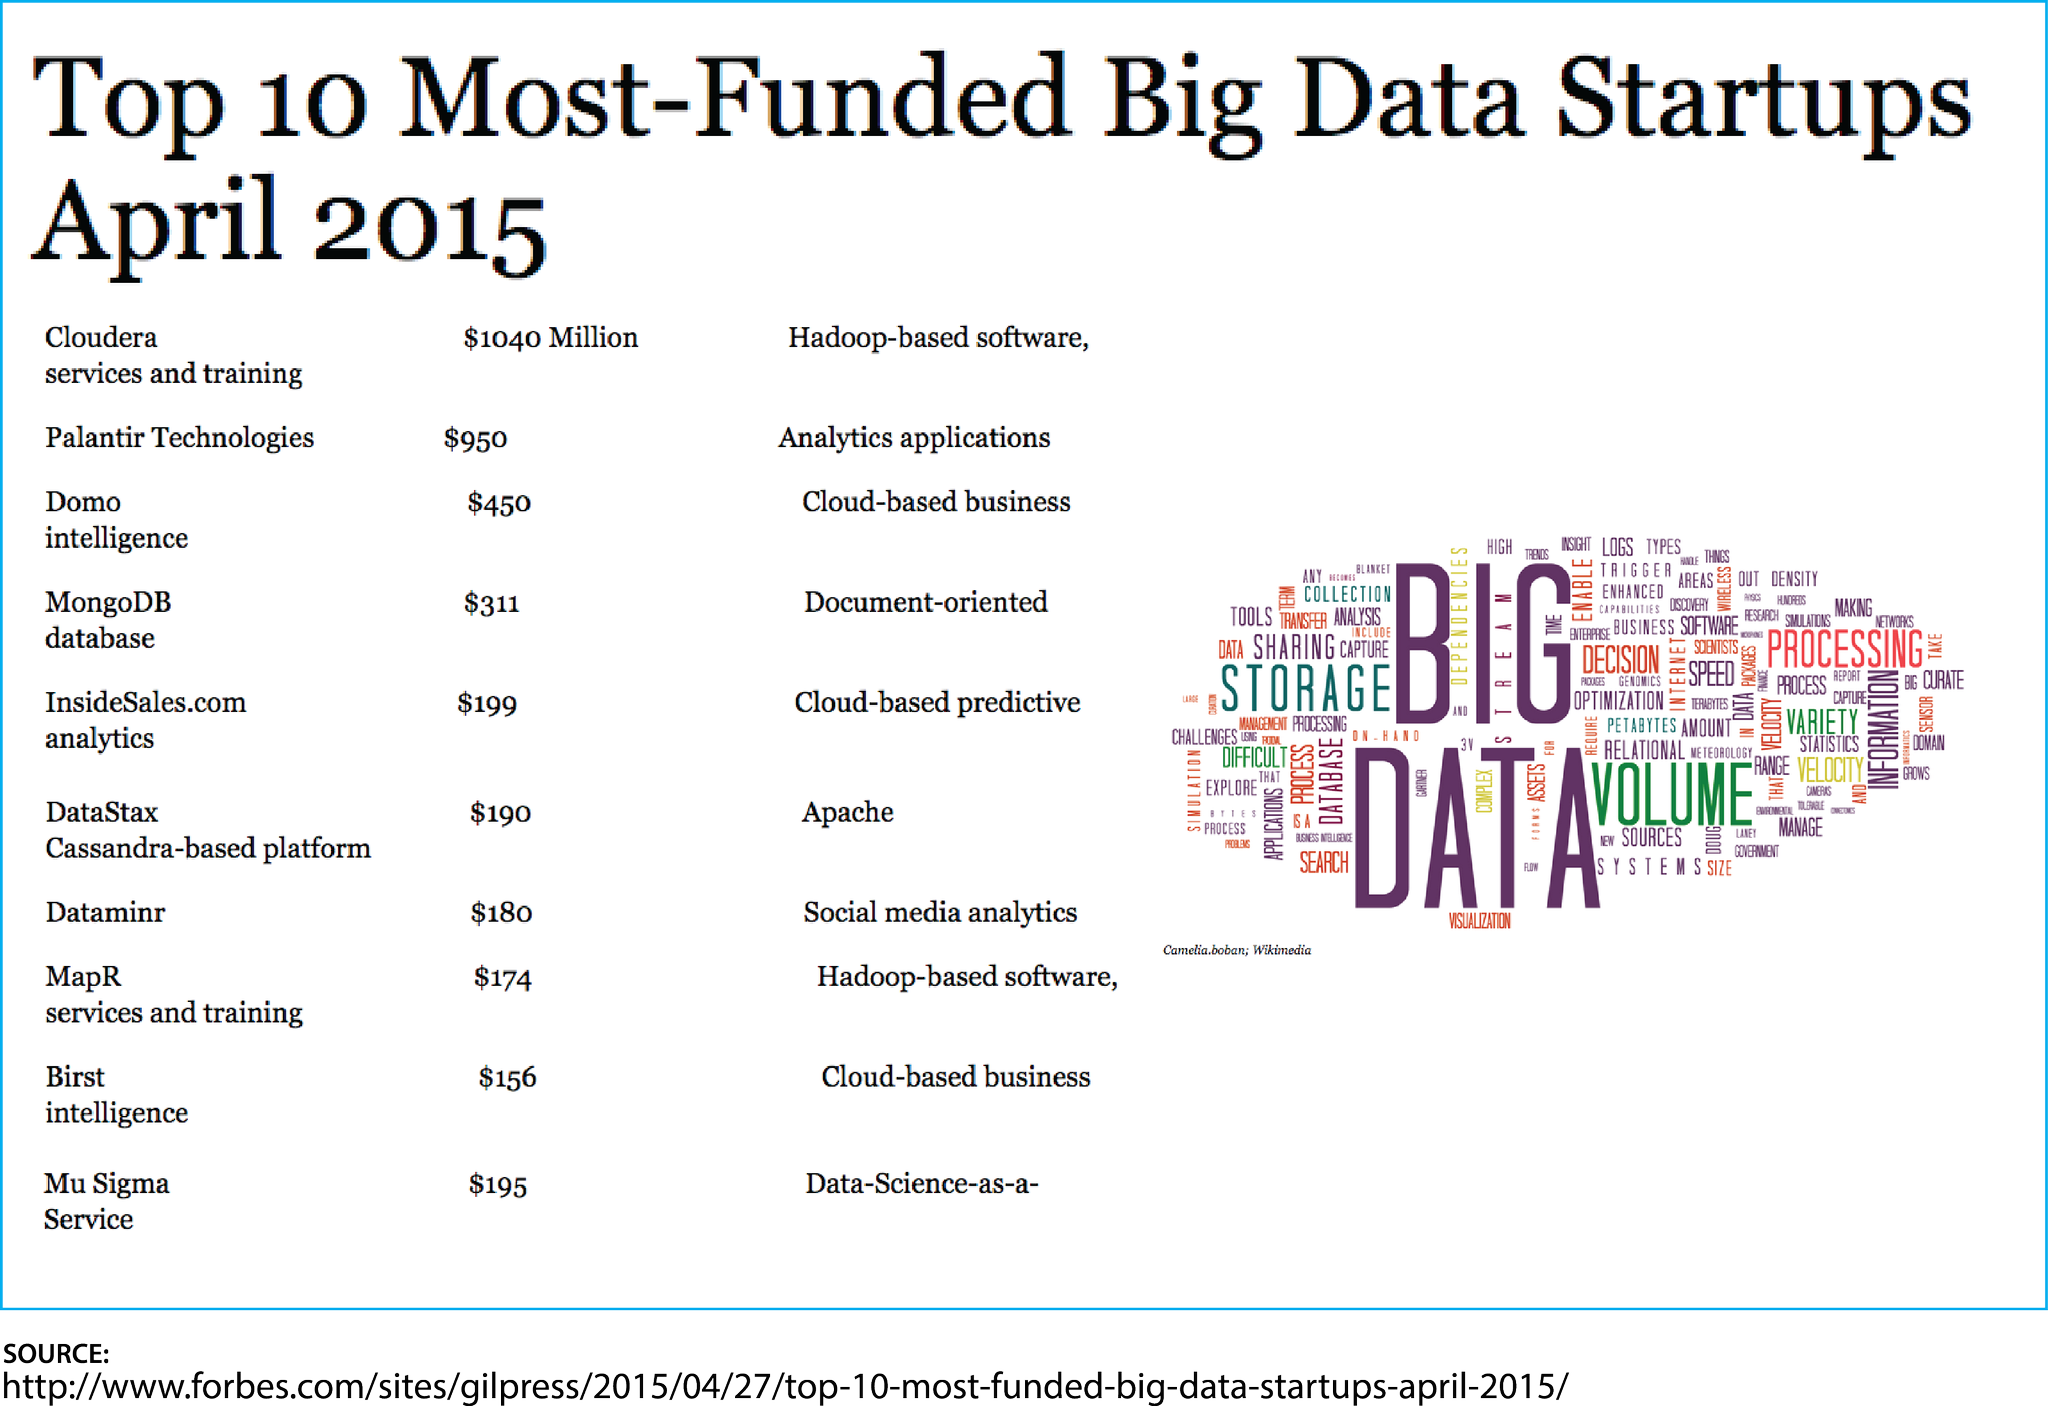 Top 10 most-funded #bigdata startups.. via @Forbes @GilPress http://t.co/I3C53OXk5b